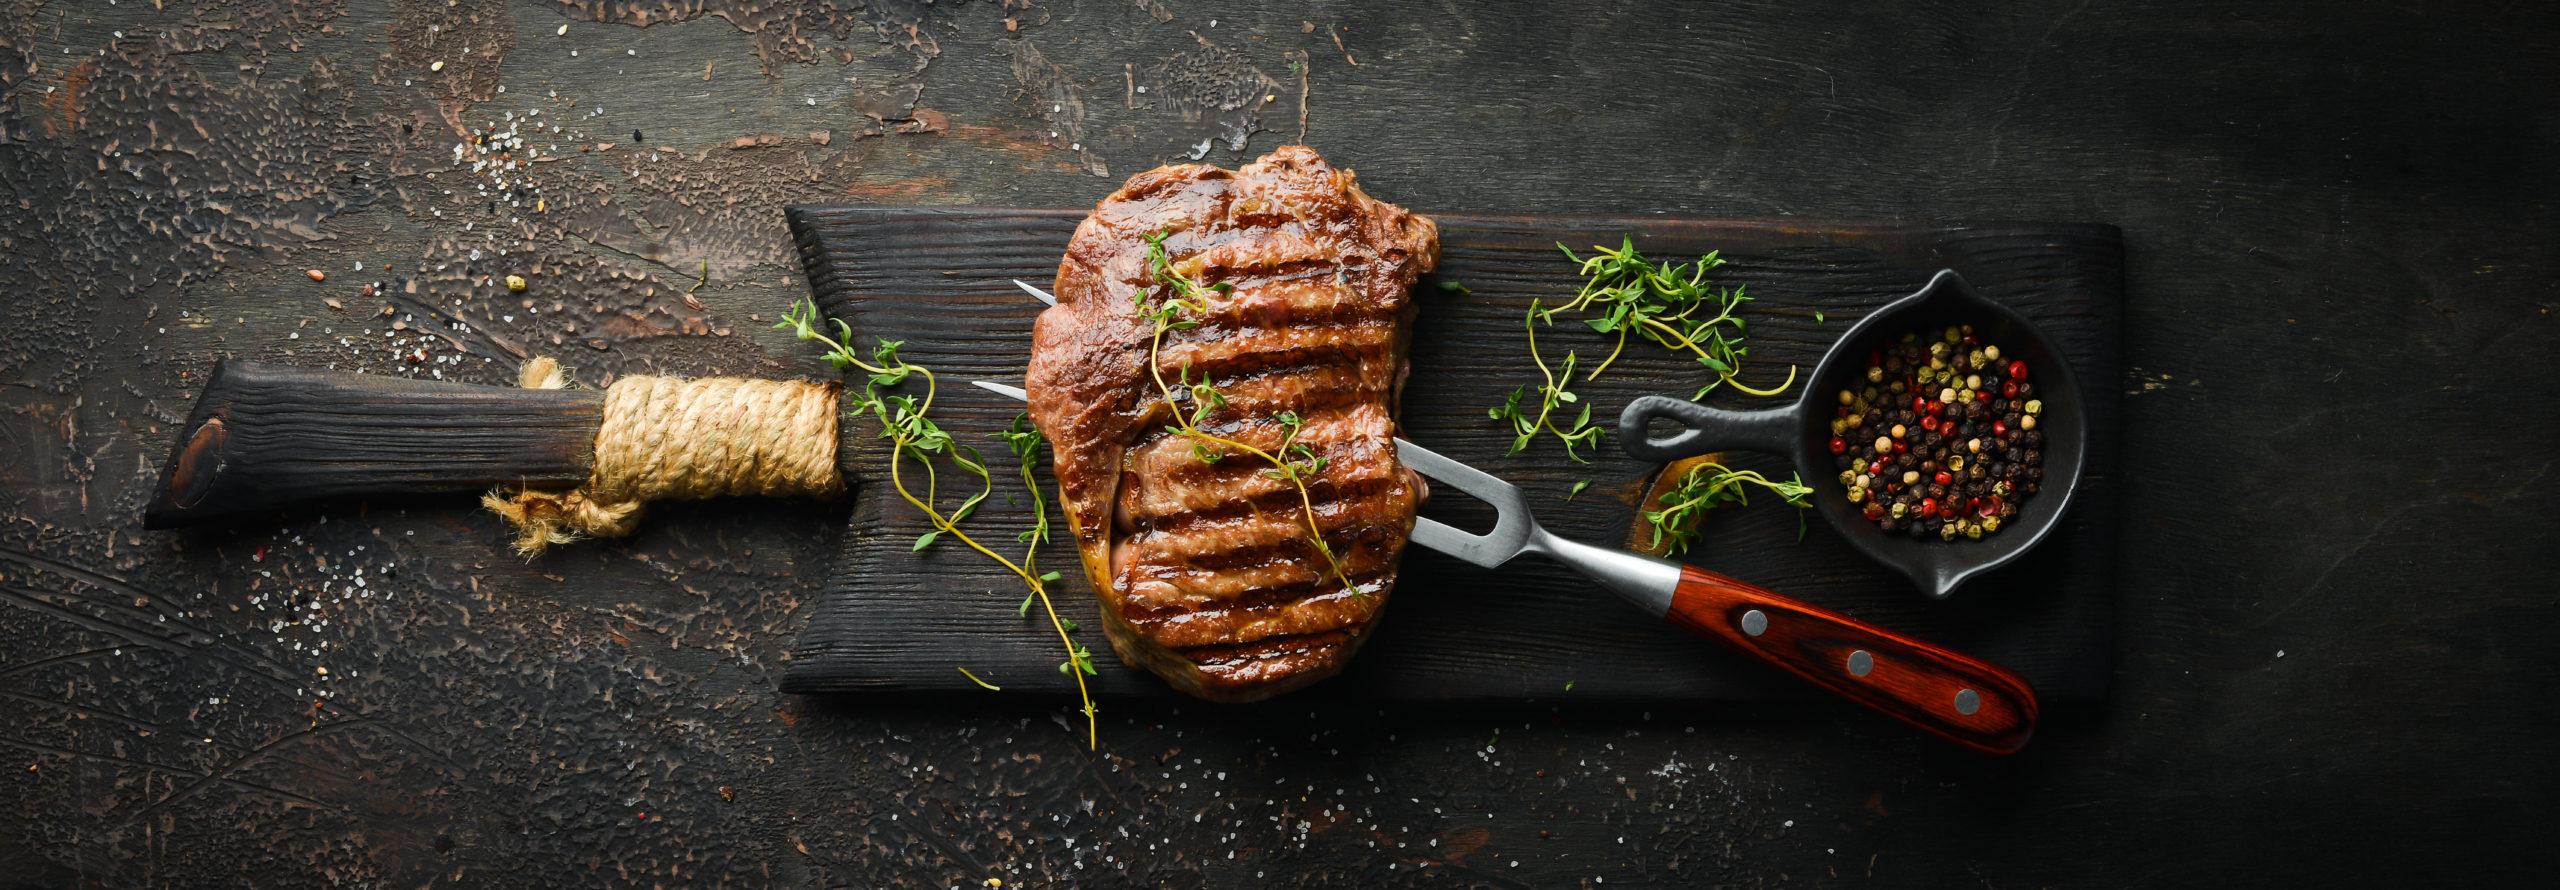 Steak Me Up, Before You Go-go! photo